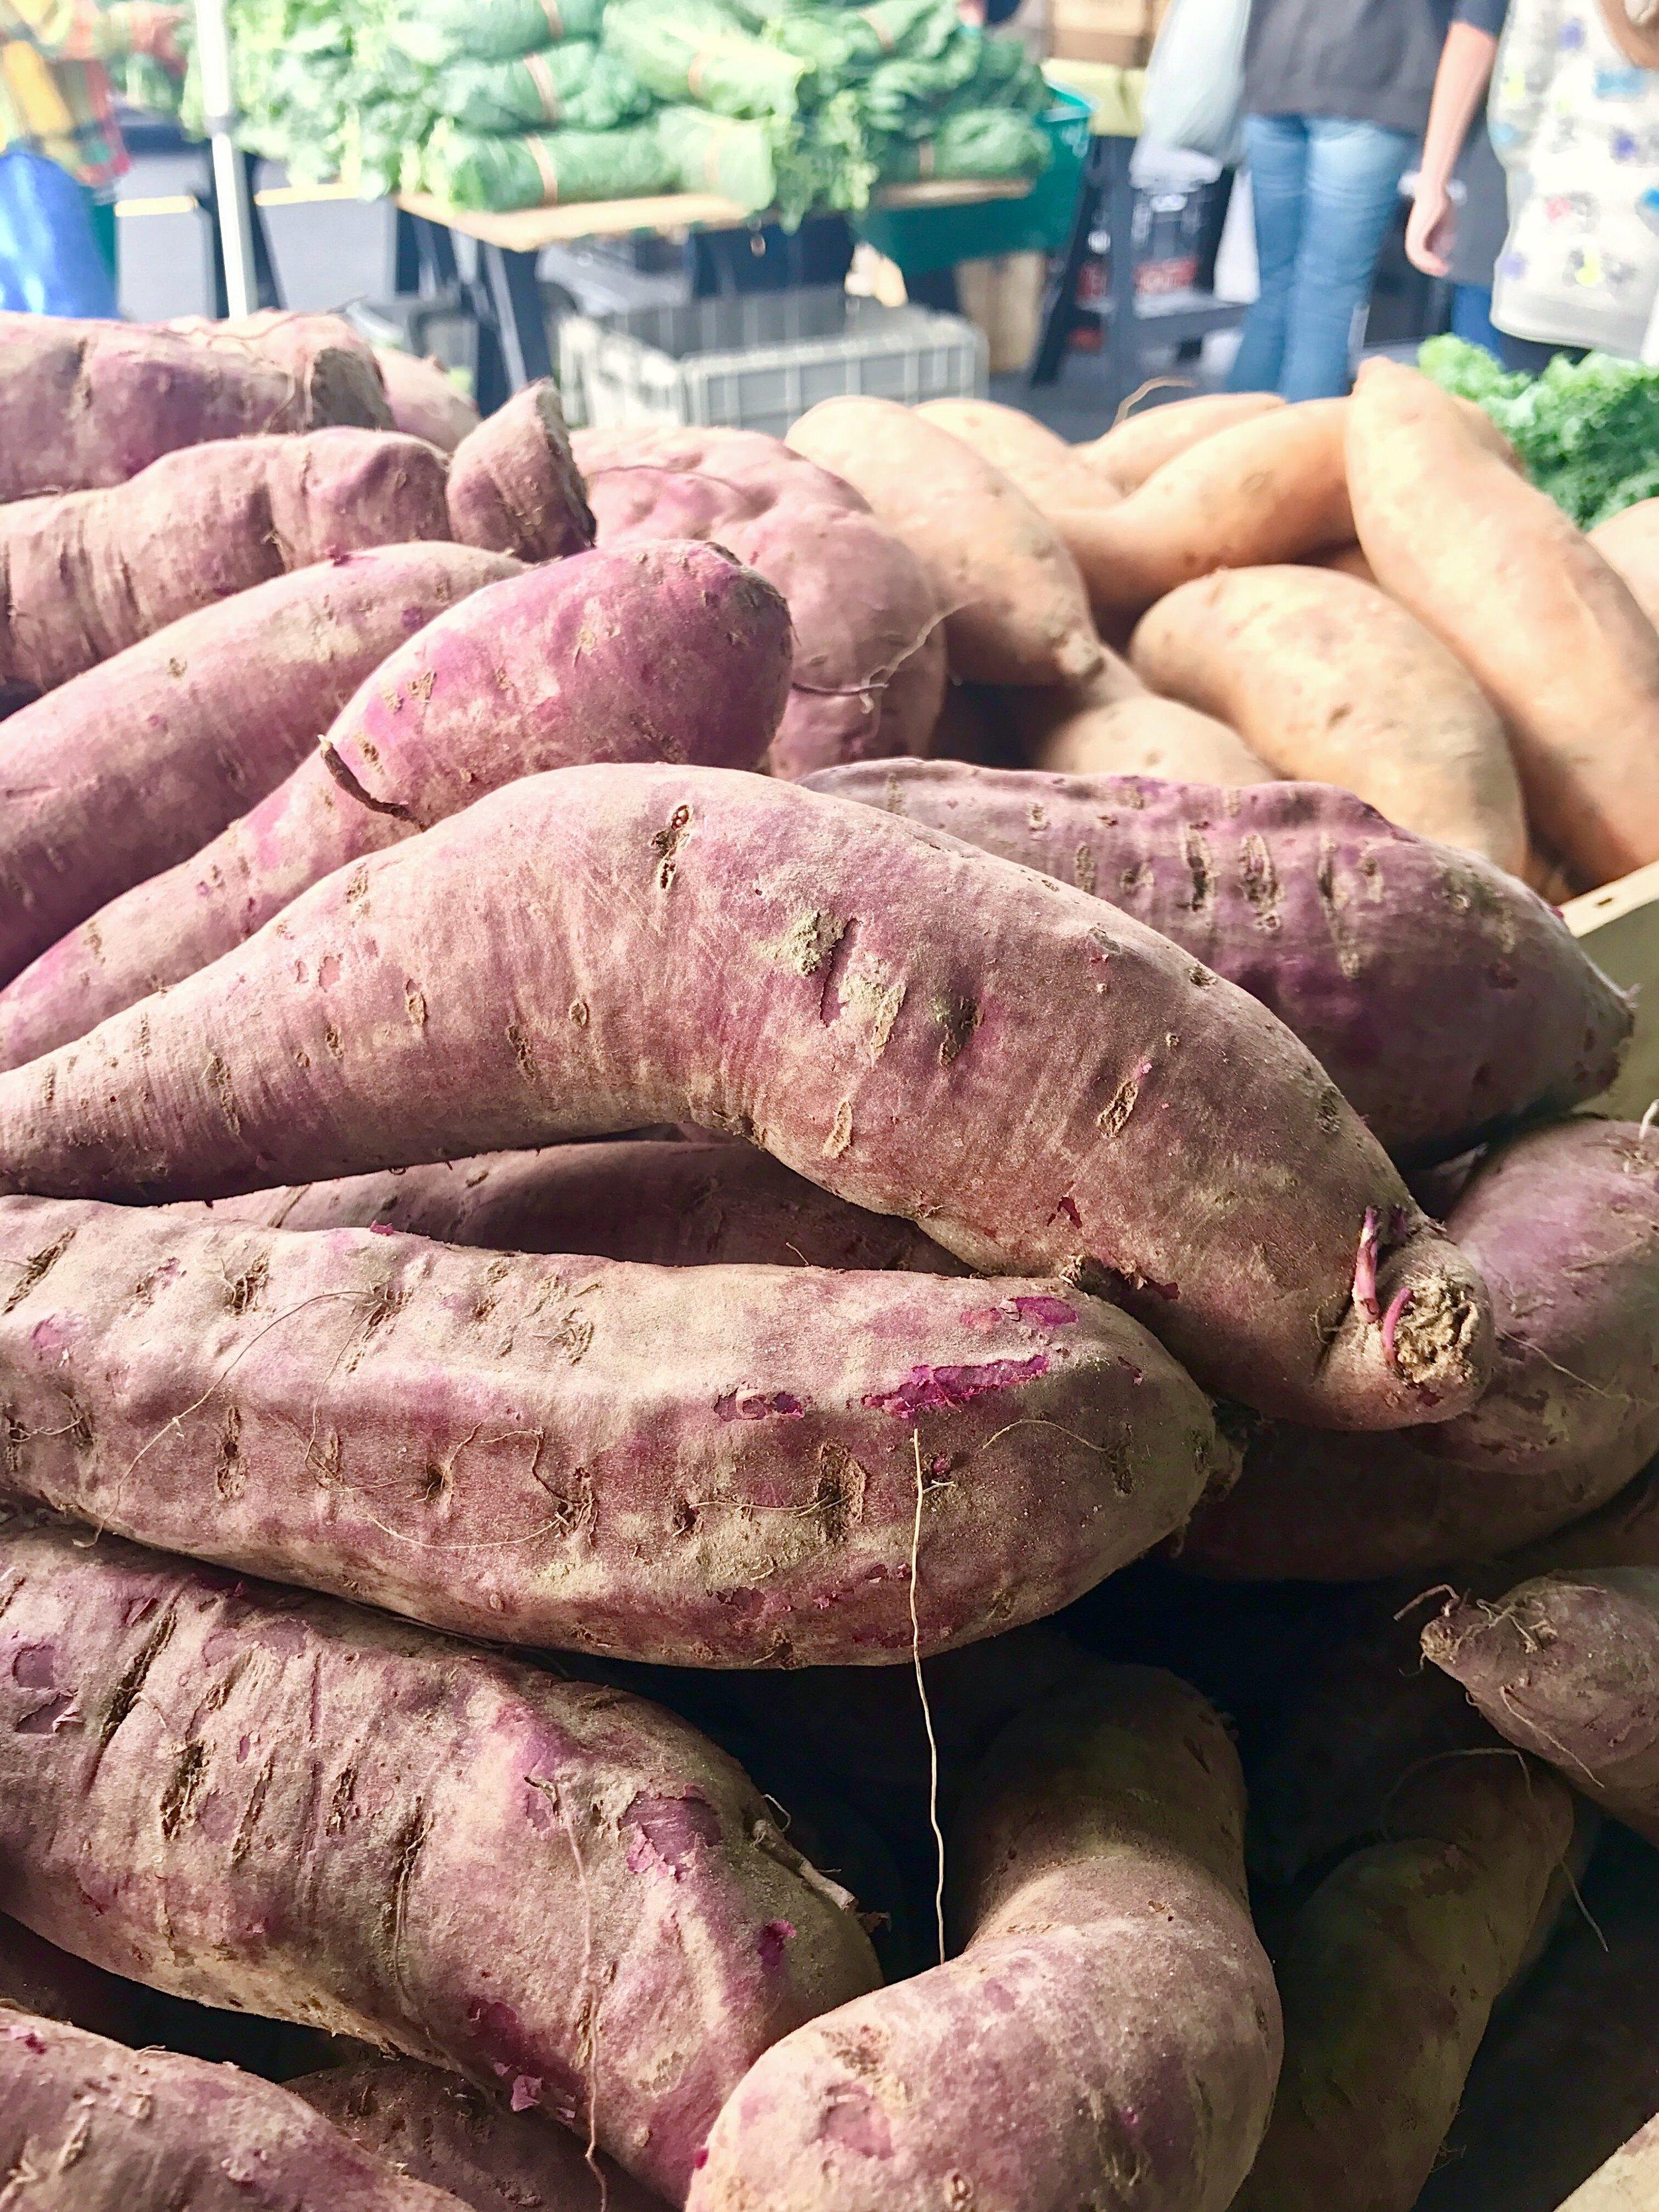 Purple Sweet Potato Hummus The Full Table Blog 2.JPG